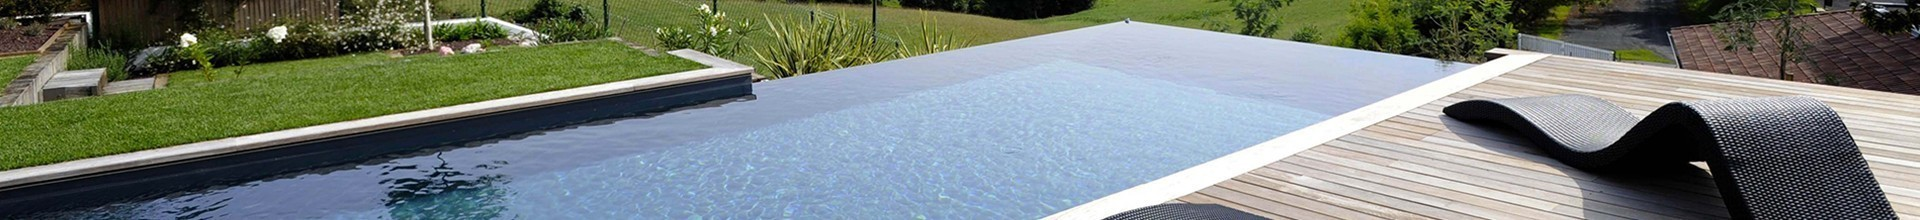 Direct usine, piscine coque prix Luxembourg